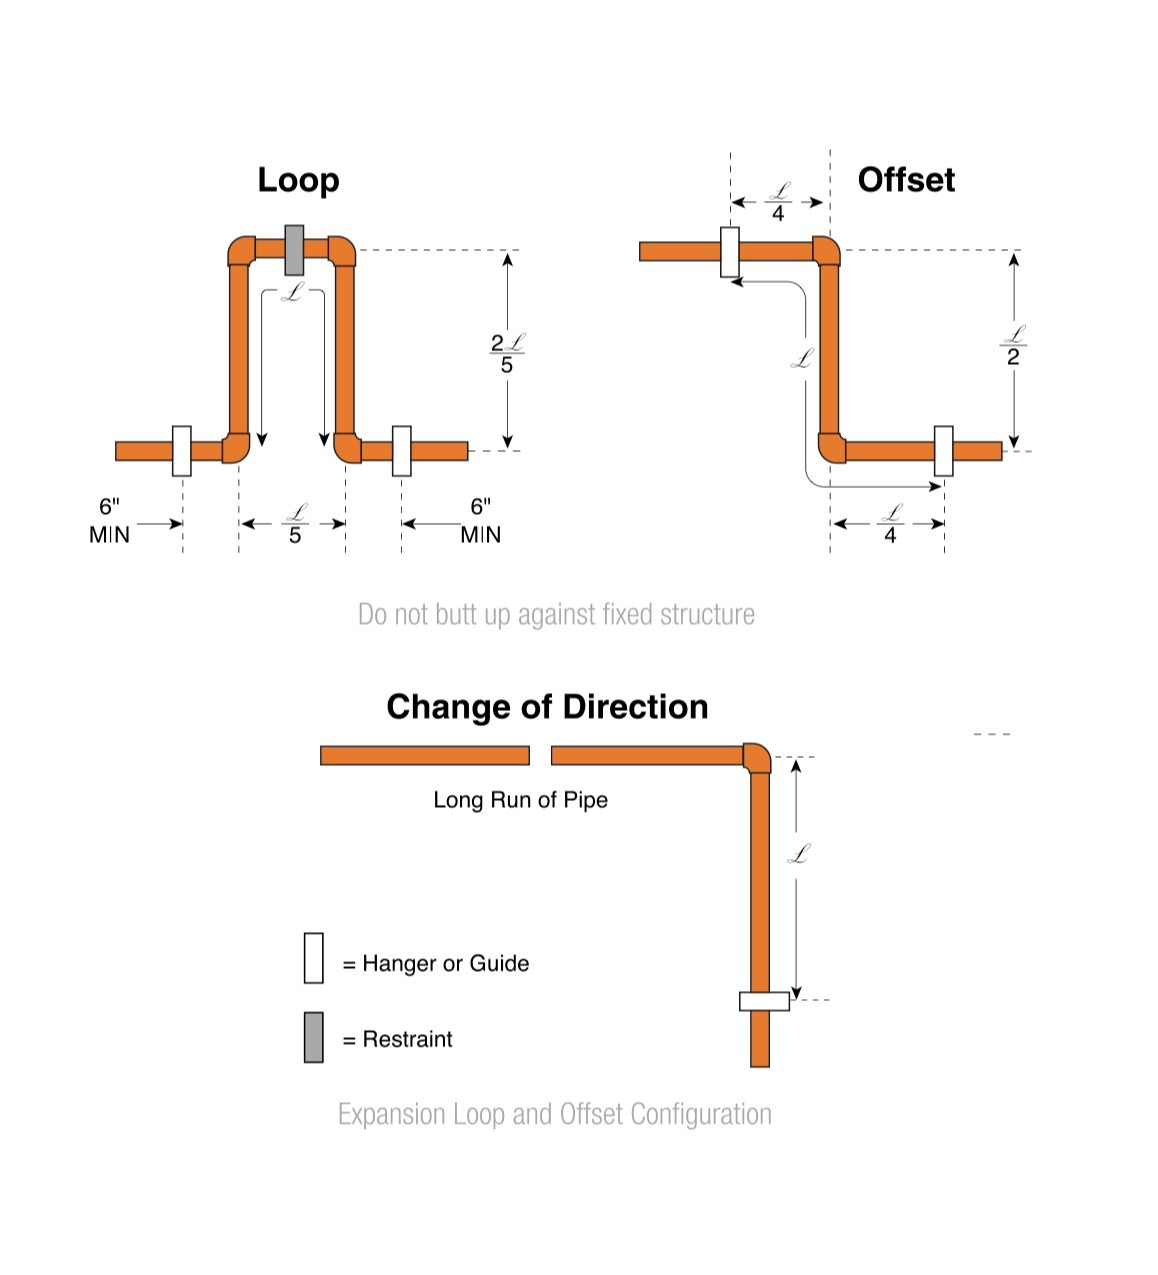 BZM_Loop_Offset_Themral-Expansion-Calc